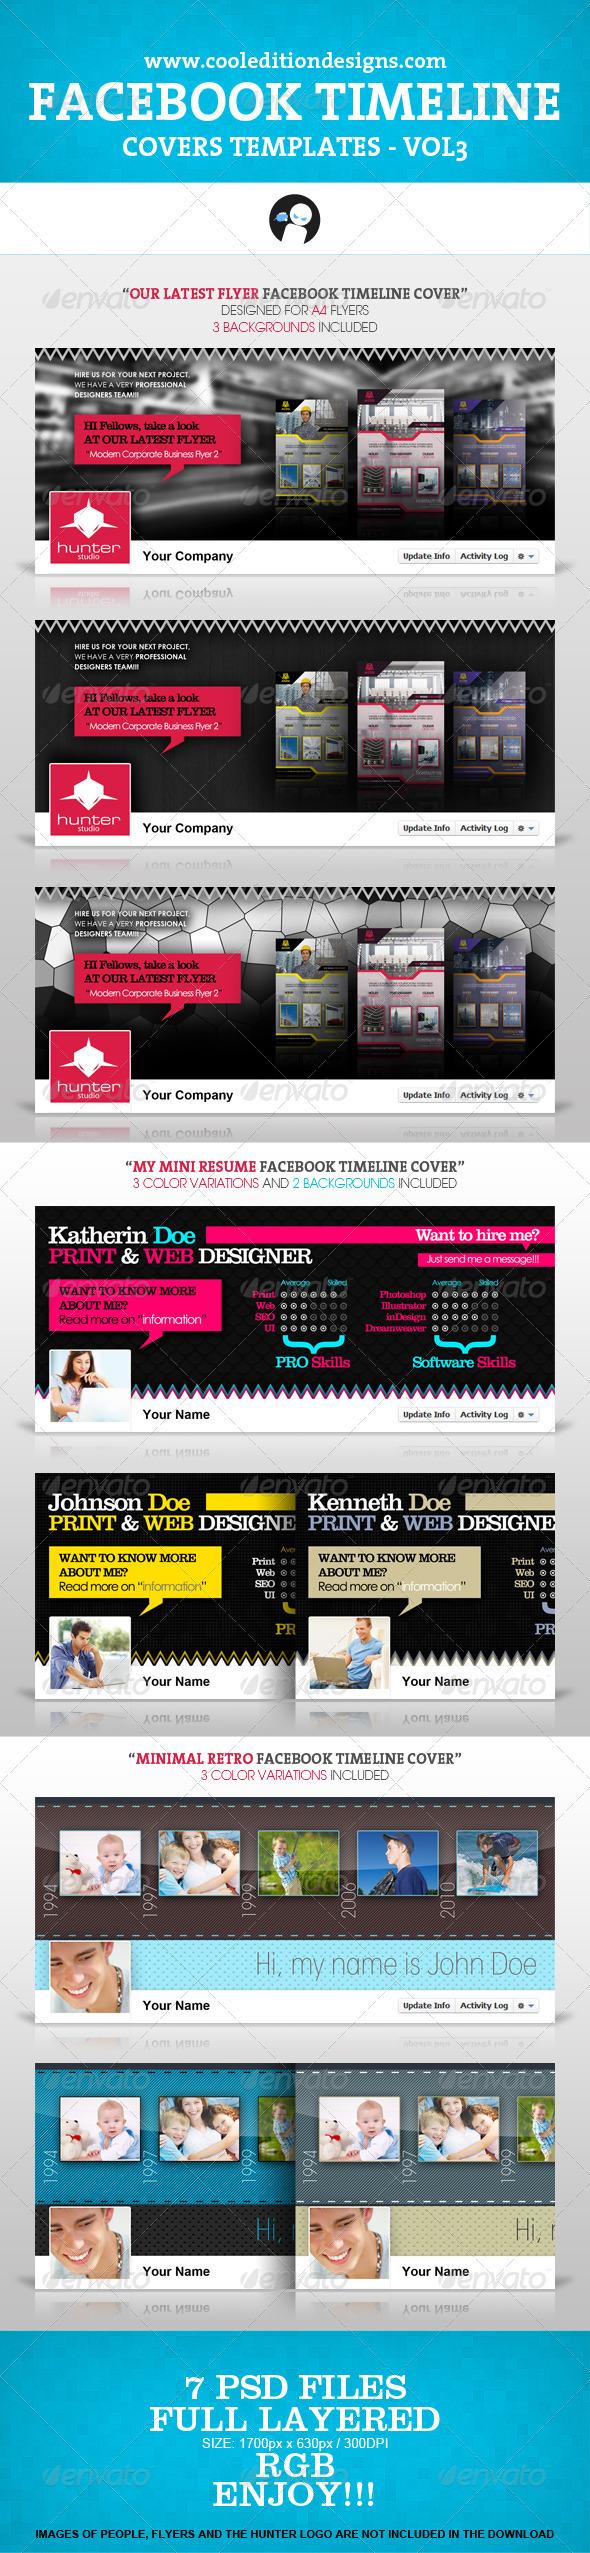 Facebook Timeline Covers Templates VOL3 - Facebook Timeline Covers Social Media